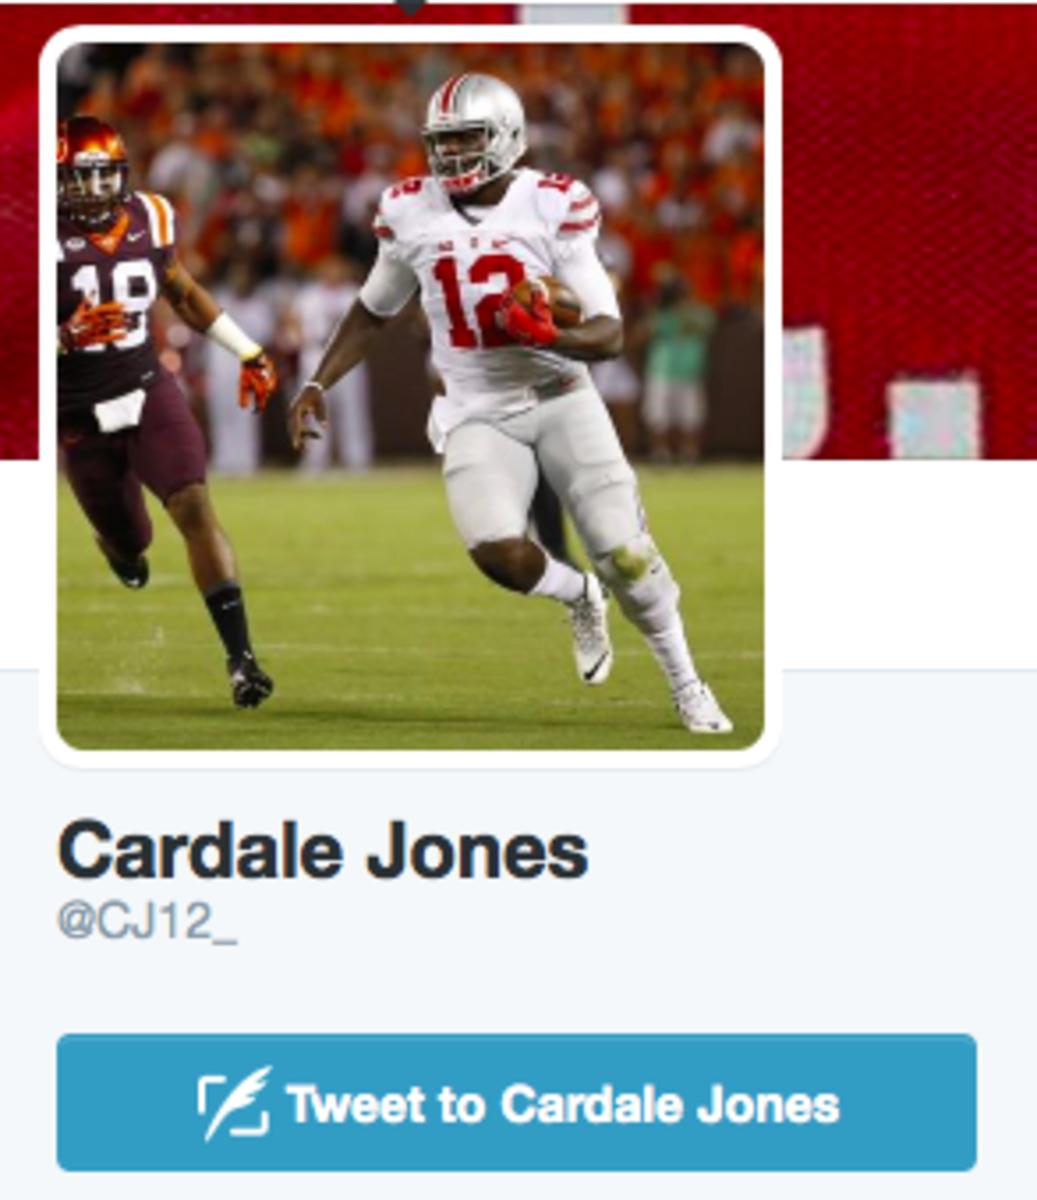 cardale-jones-bio-3.png